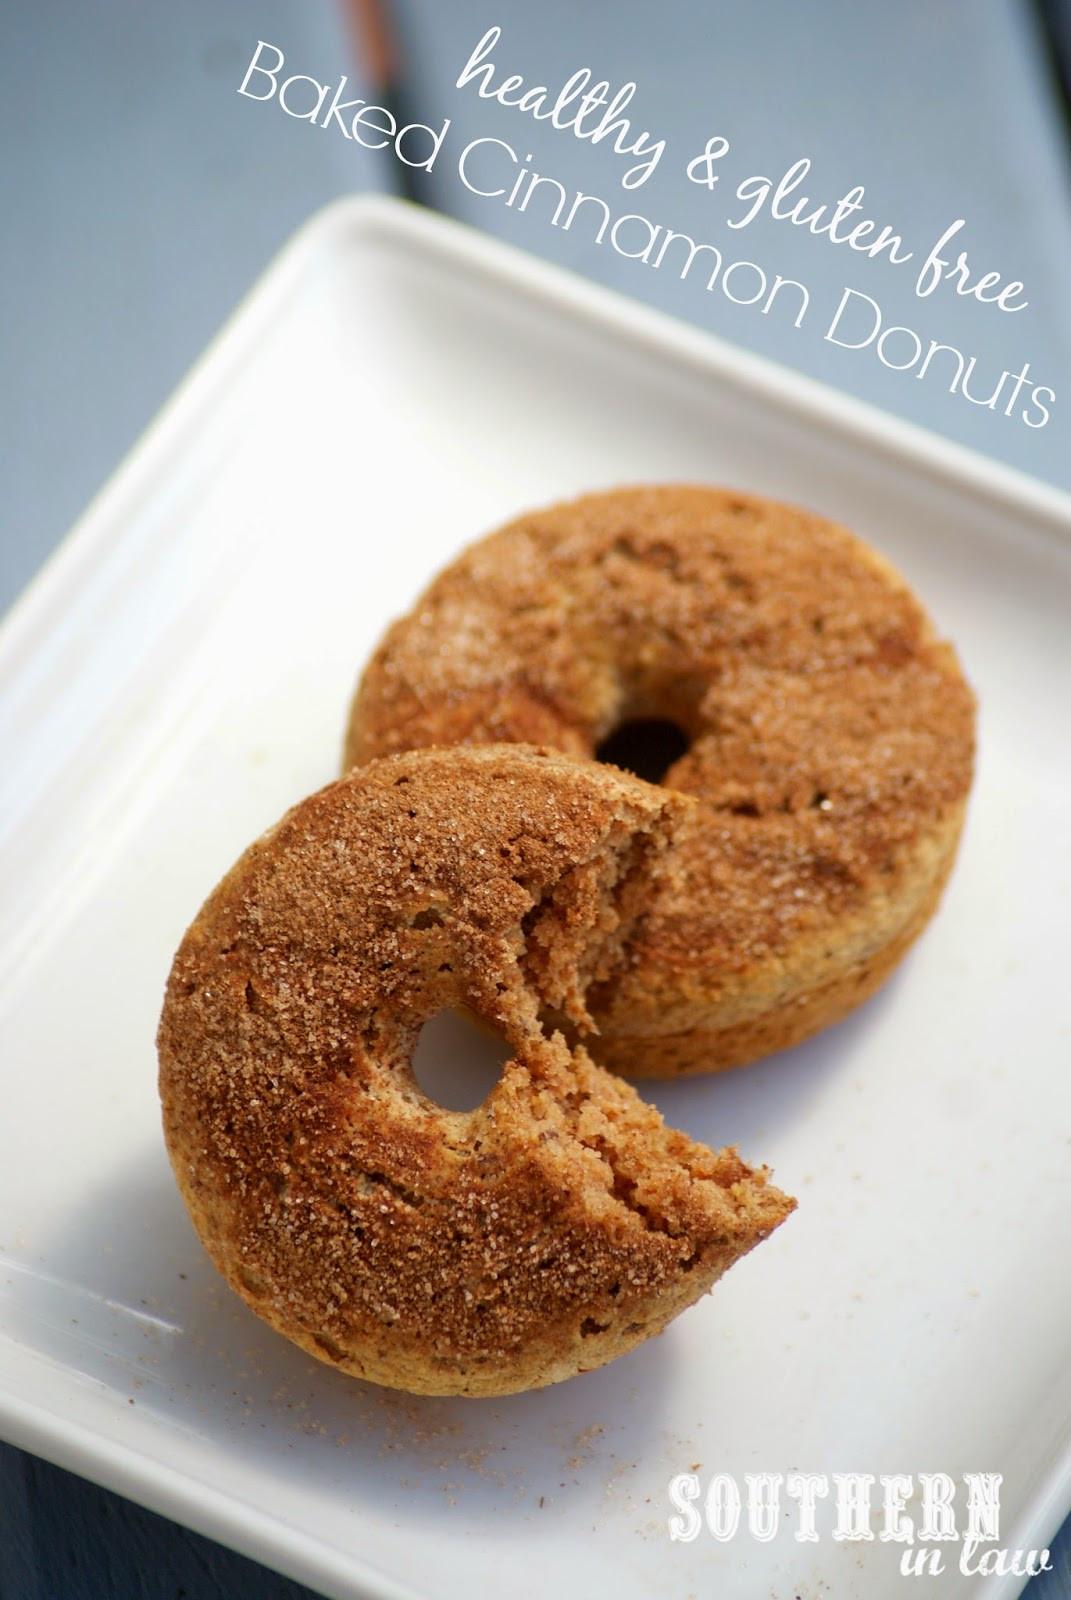 Vegan Baking Recipes  Southern In Law Recipe Healthy Vegan Baked Cinnamon Donuts